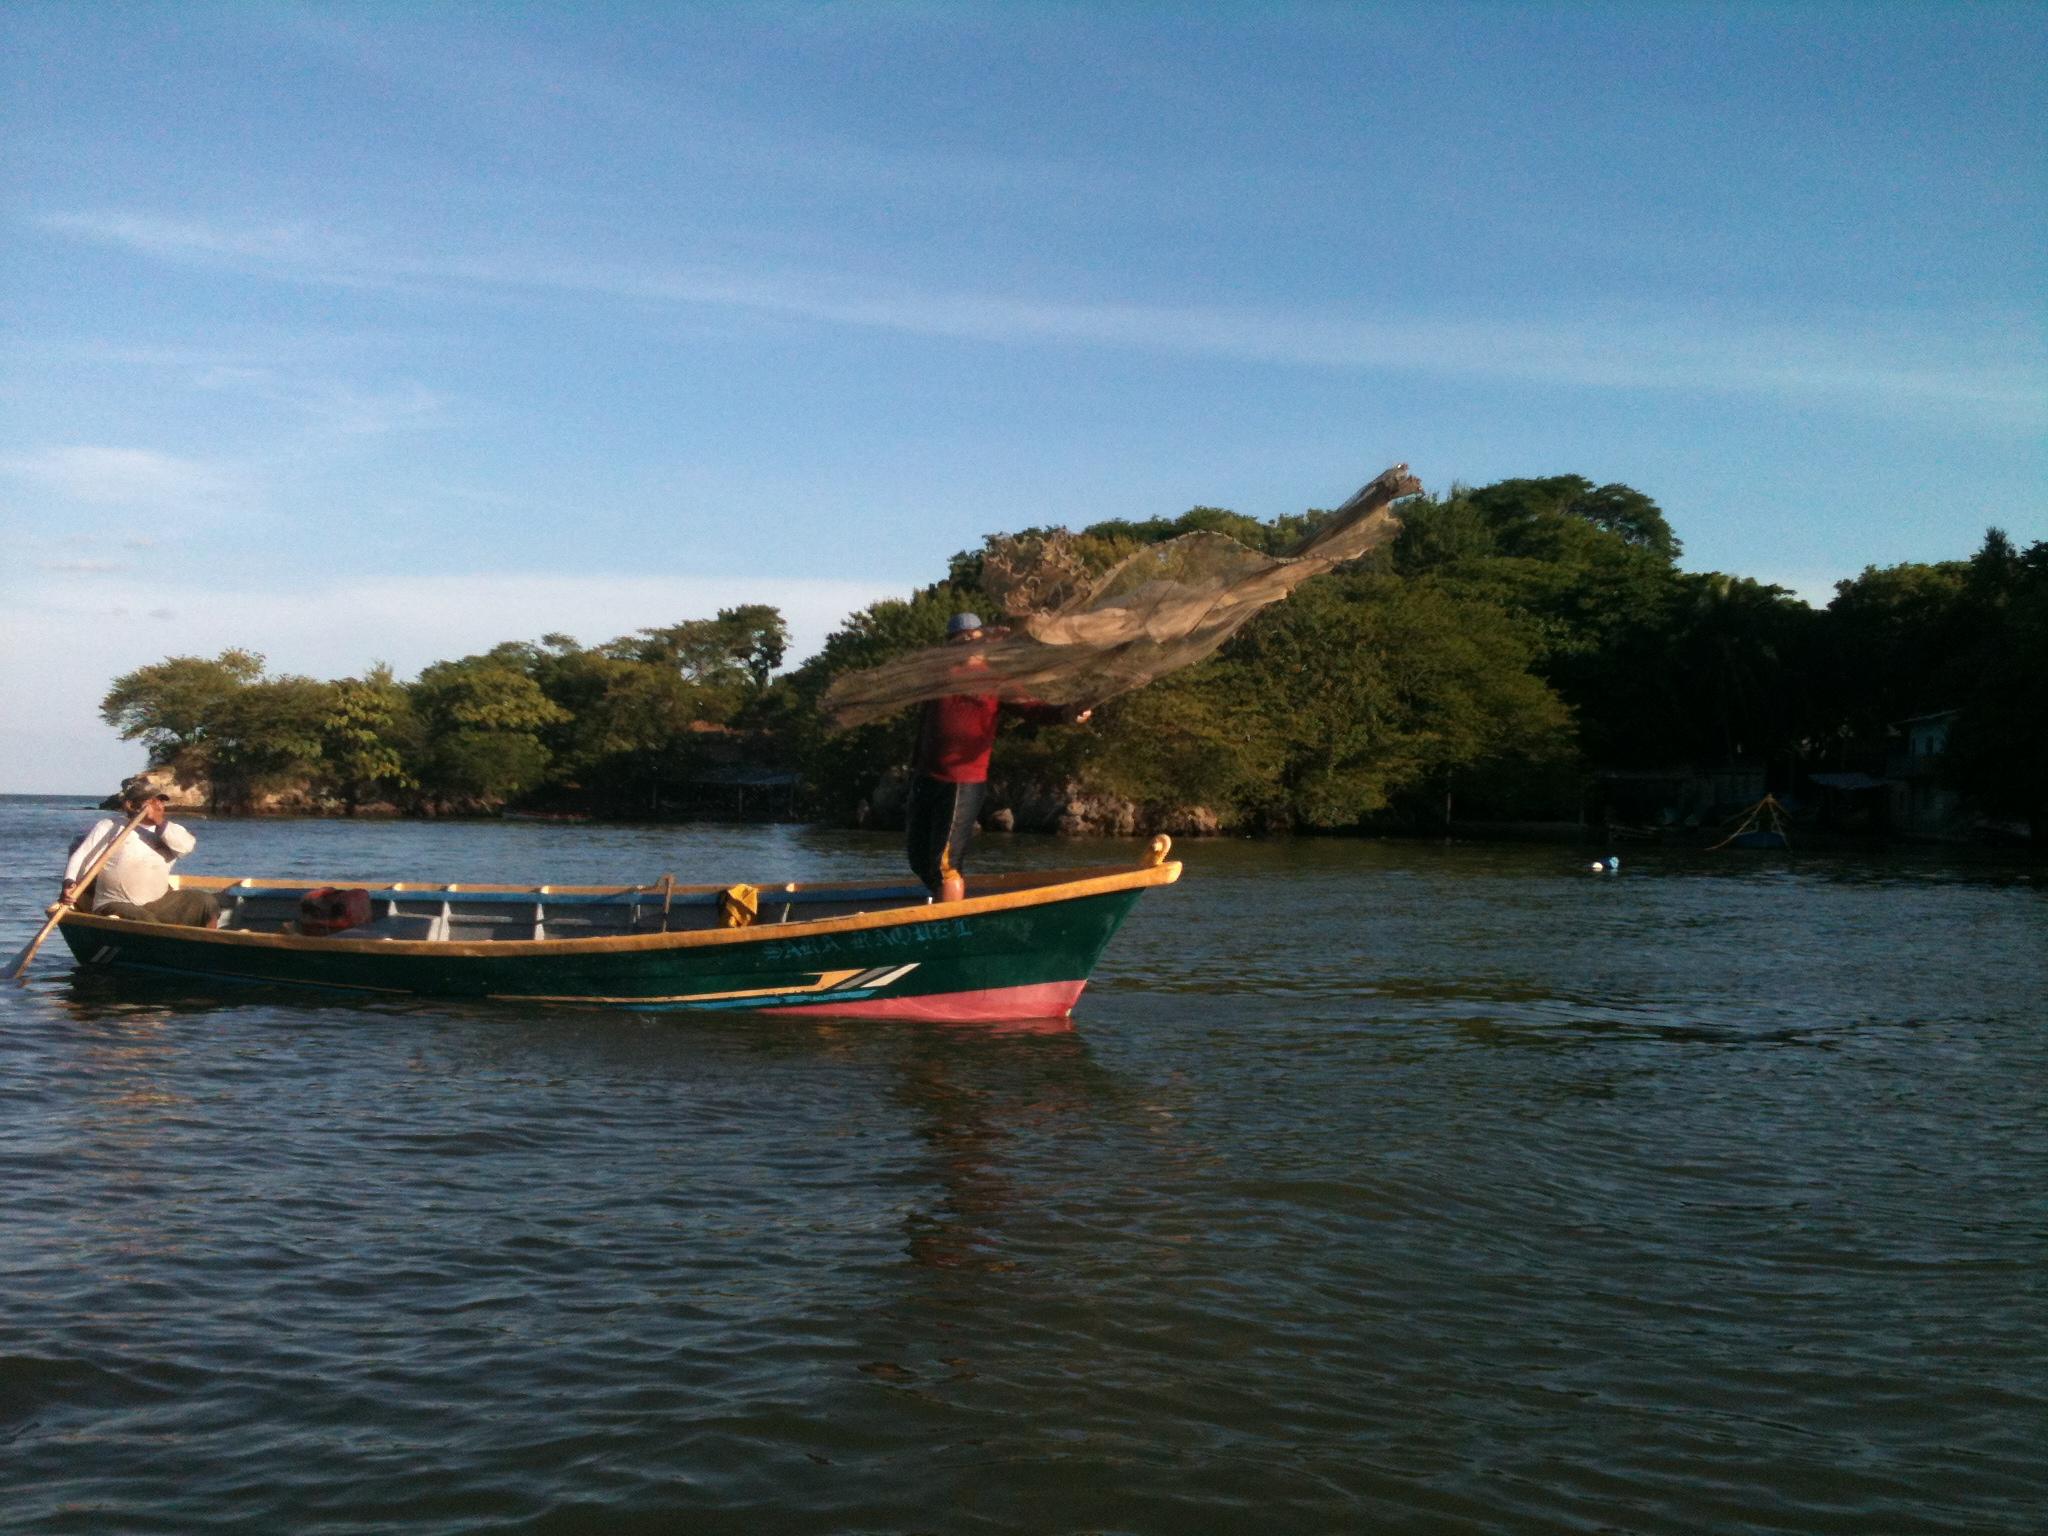 Turismo Cultural Pesca El Salvador